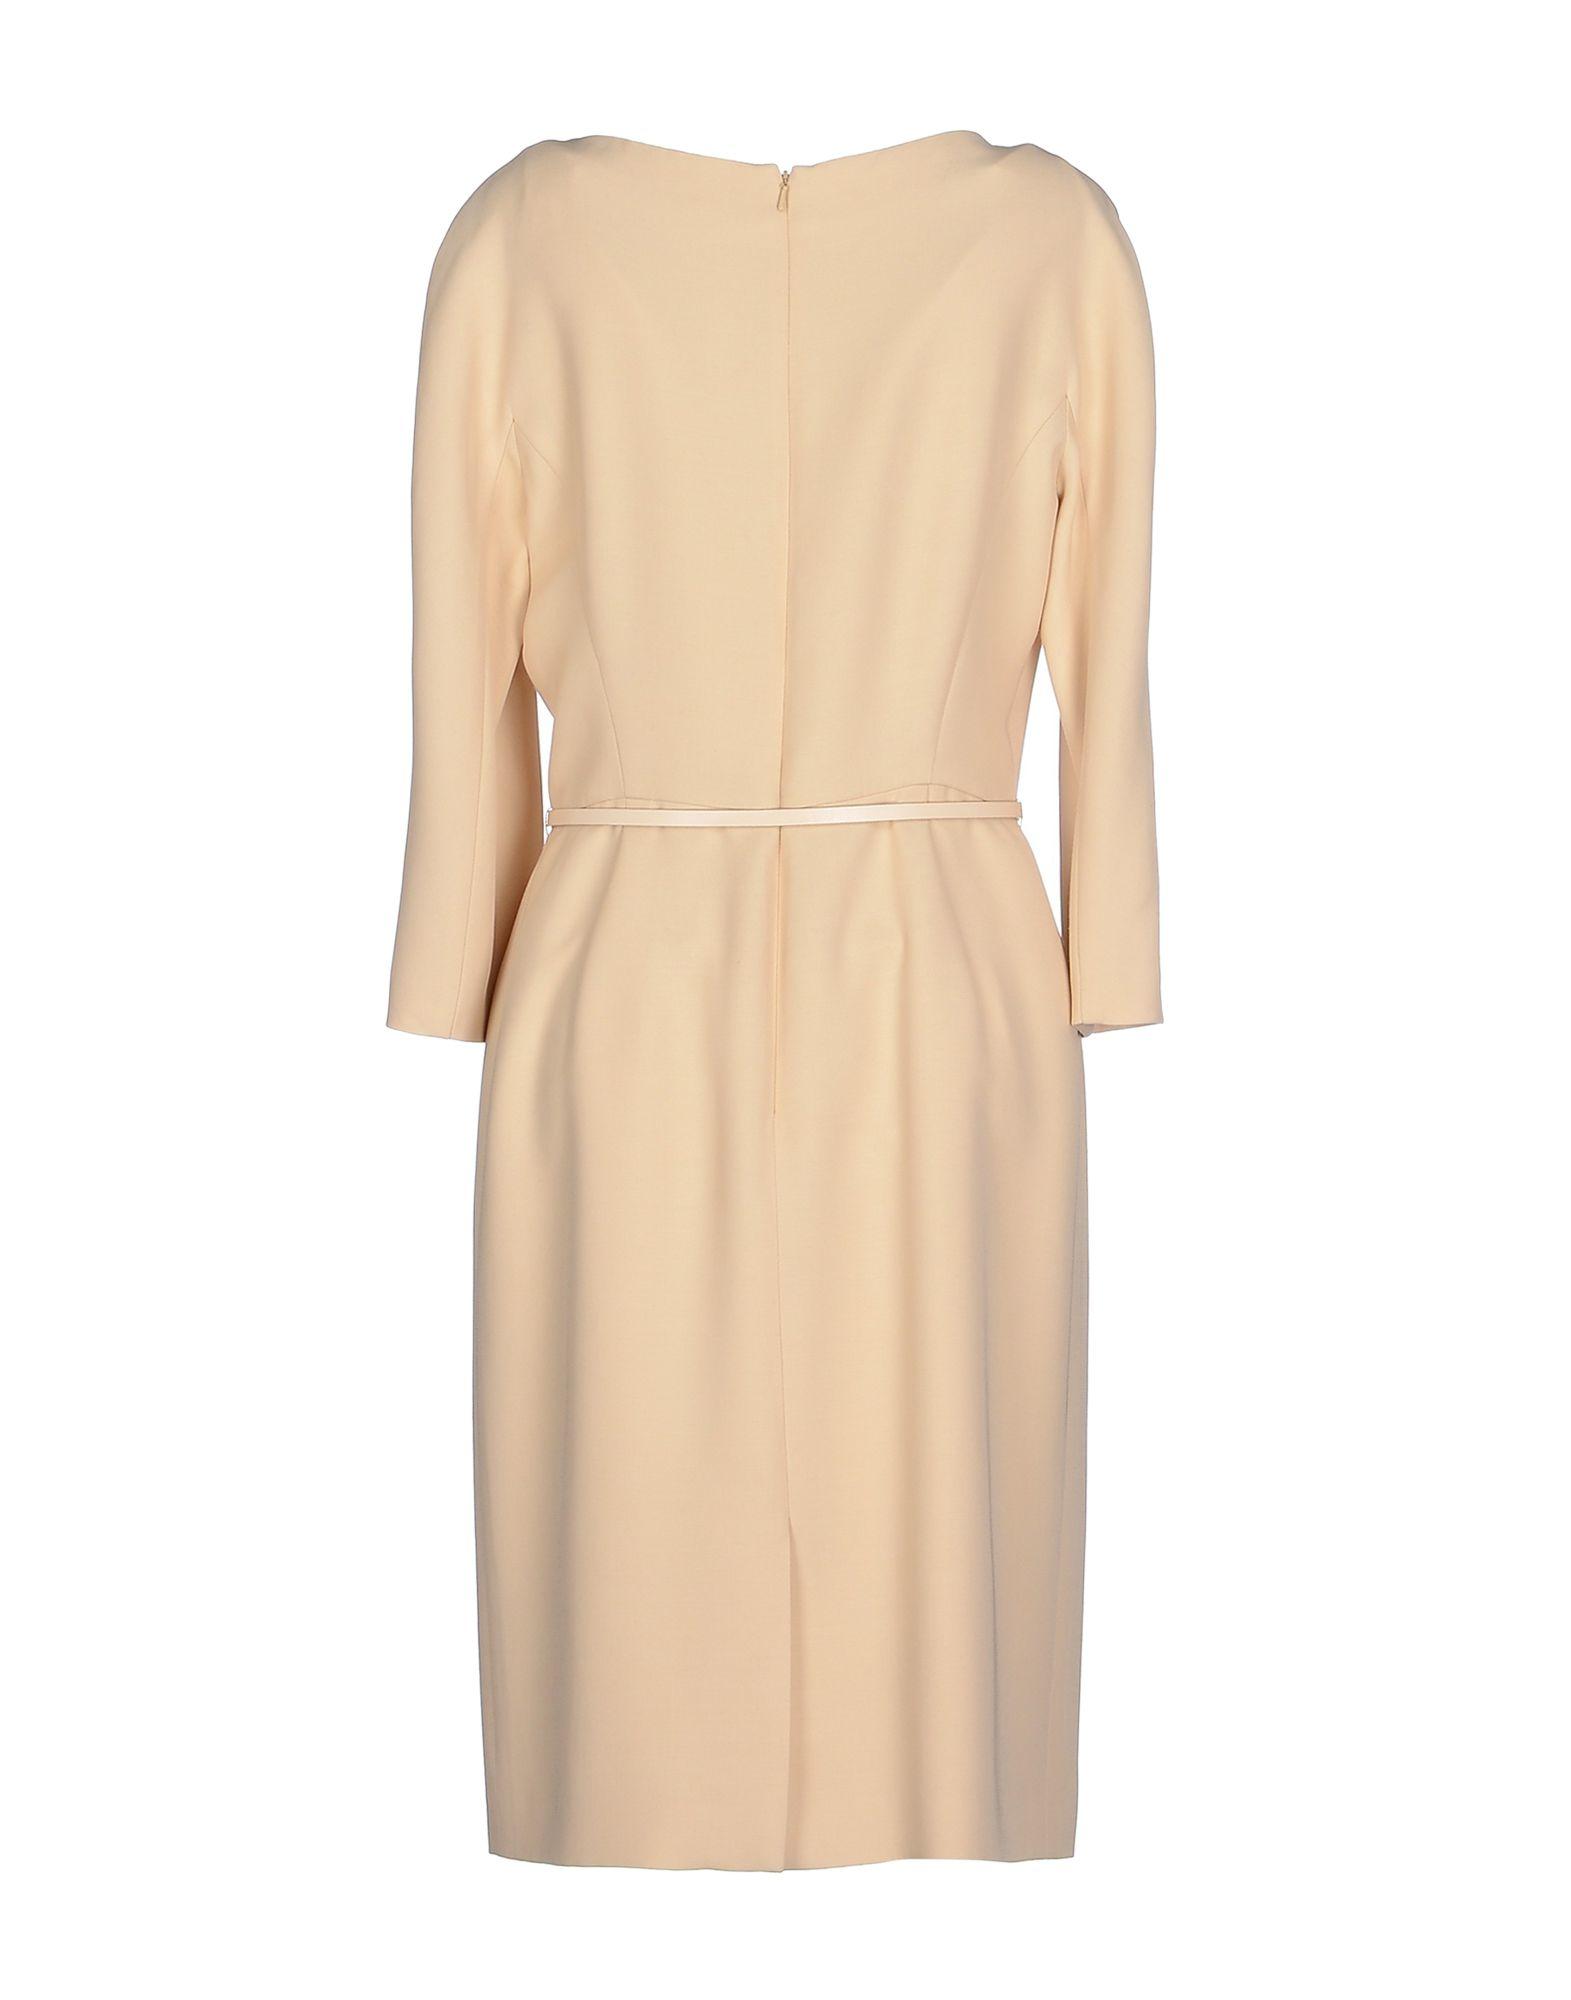 dior short dresses - photo #45